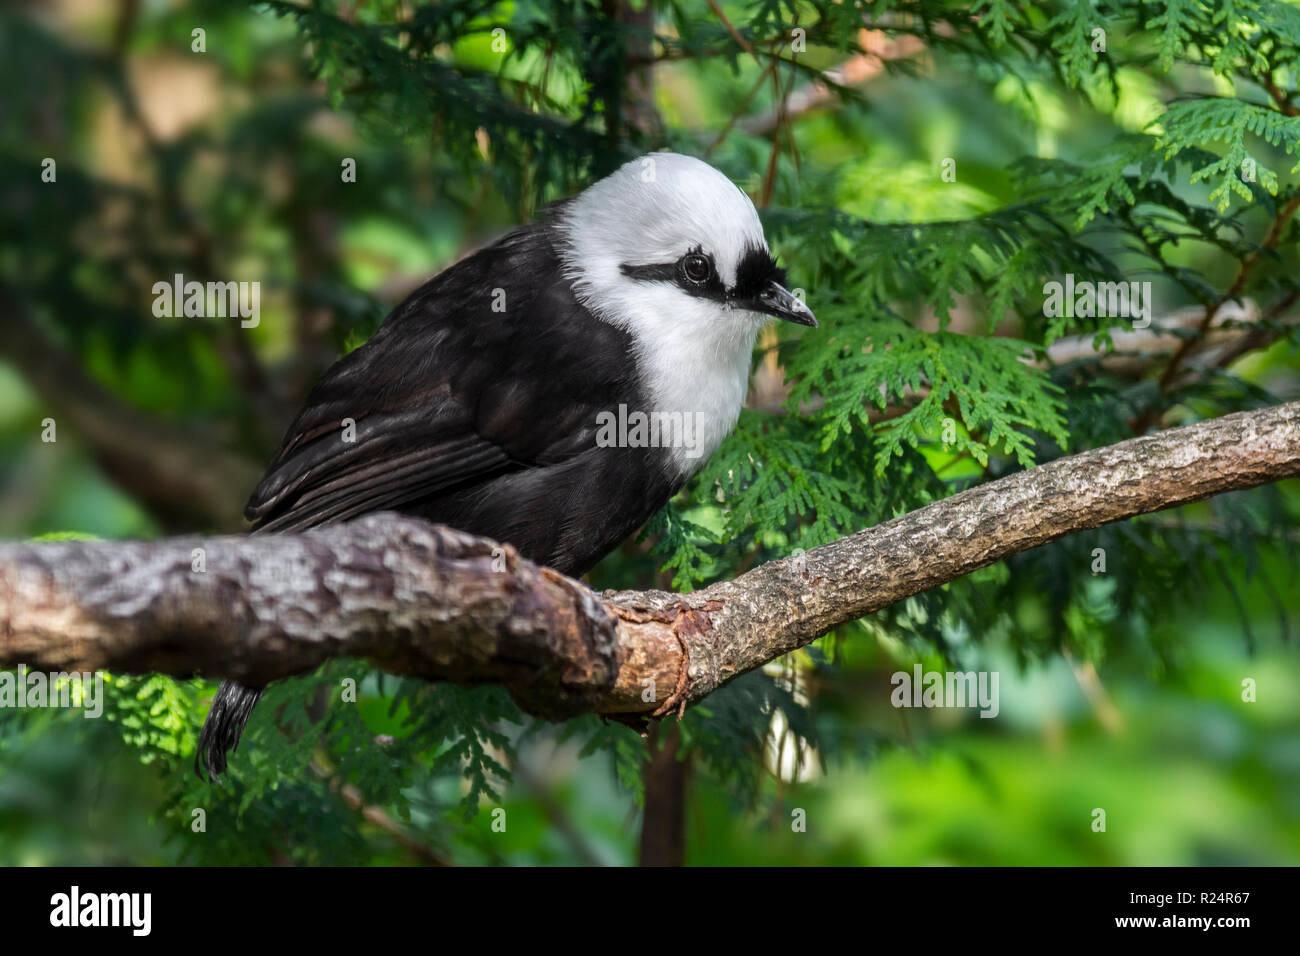 Sumatran laughingthrush / black-and-white laughingthrush (Garrulax bicolor) endemic to the Indonesian island of Sumatra - Stock Image